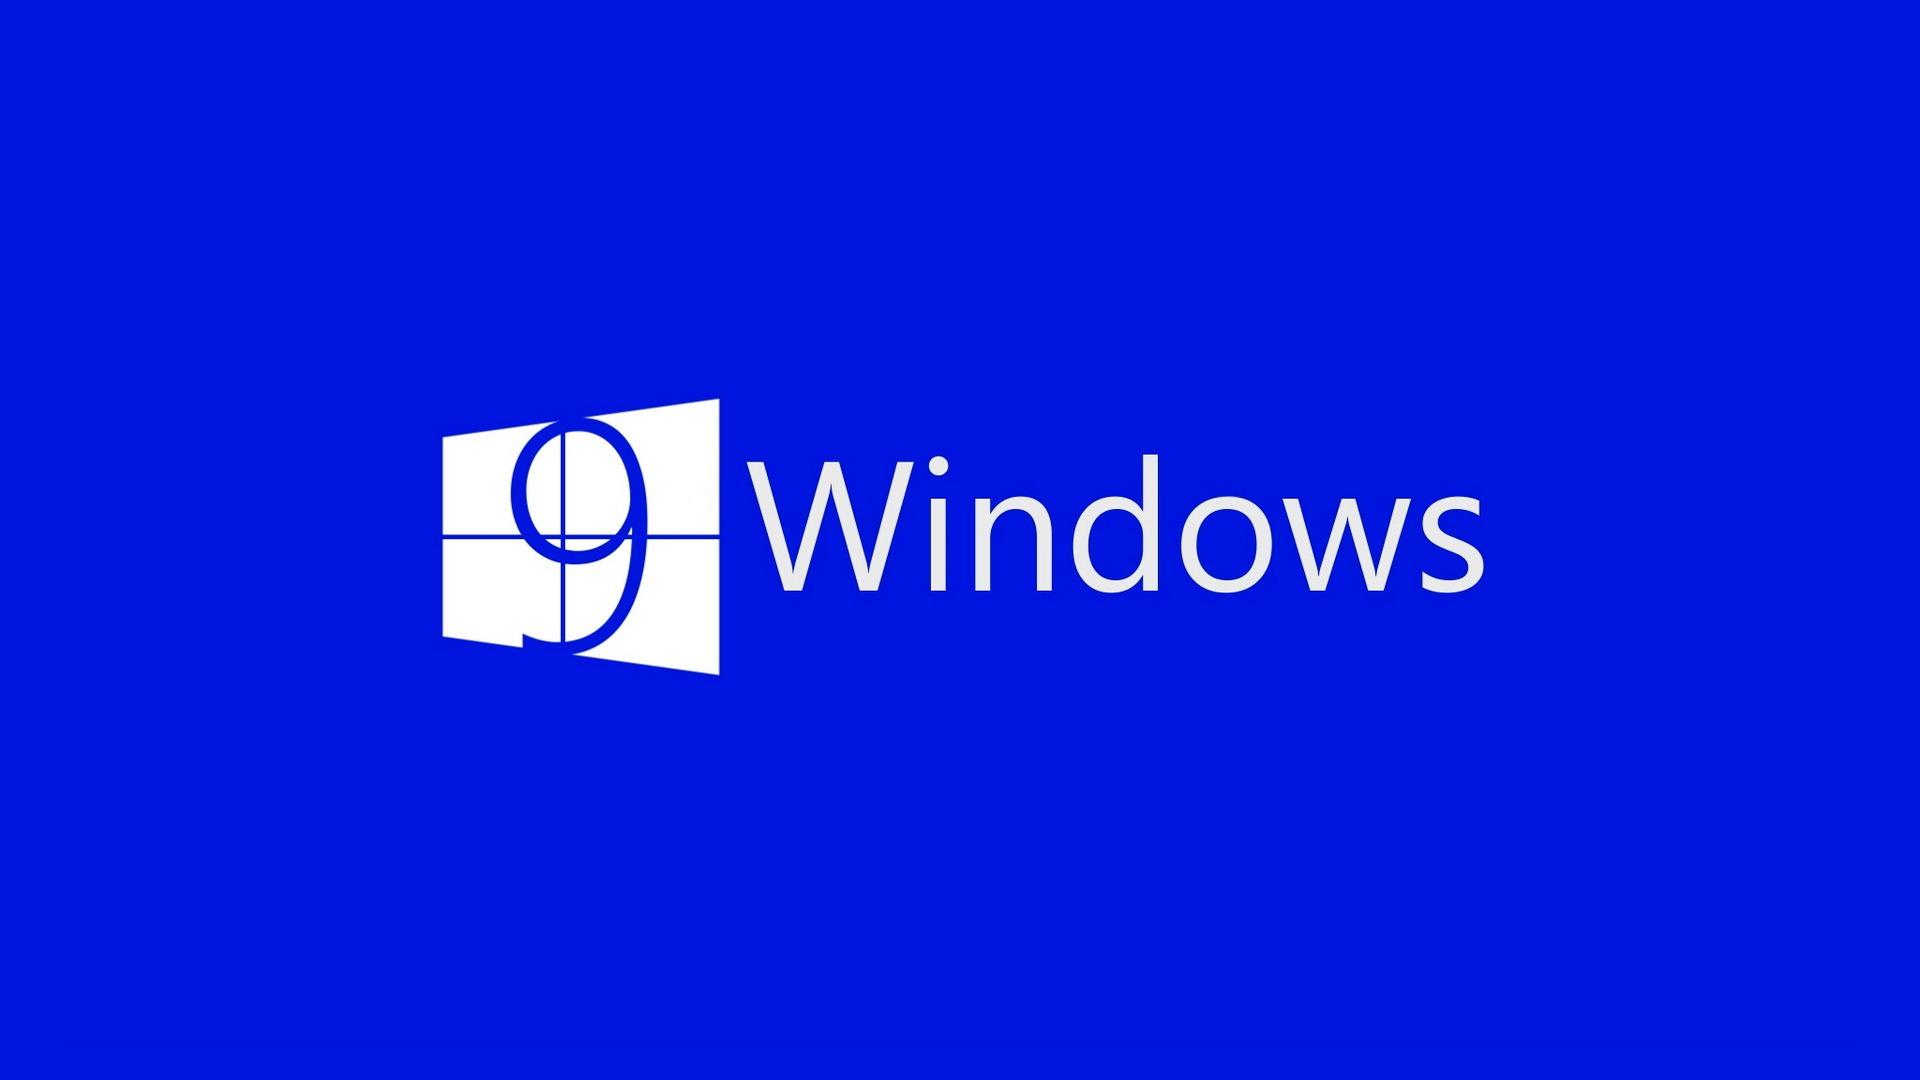 windows 9 full - photo #11